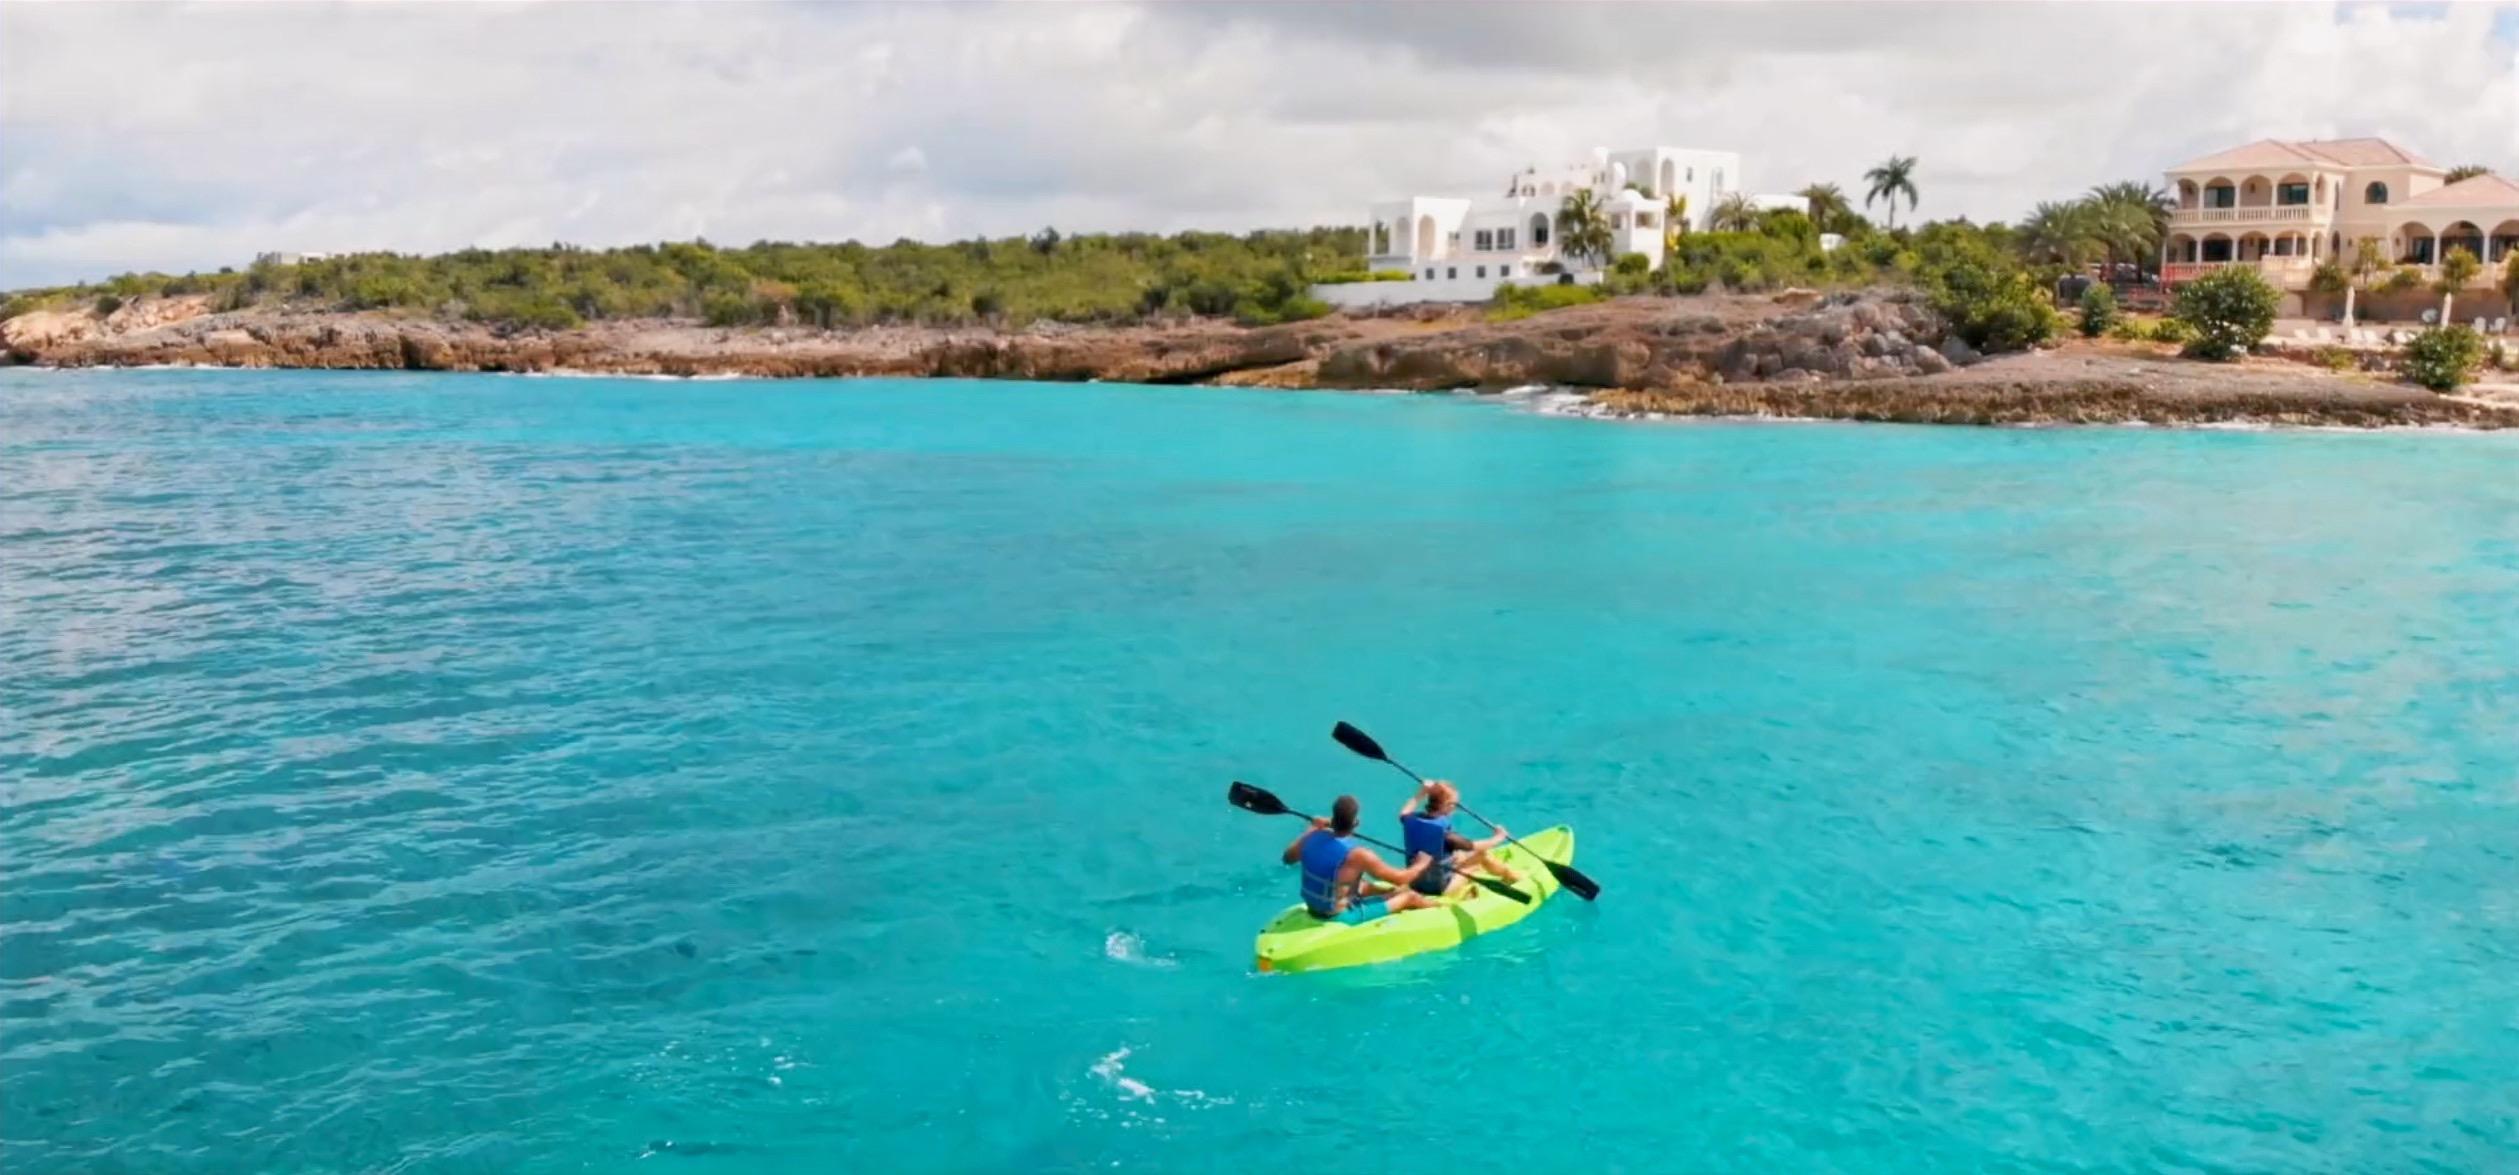 Kayak & Padelboard